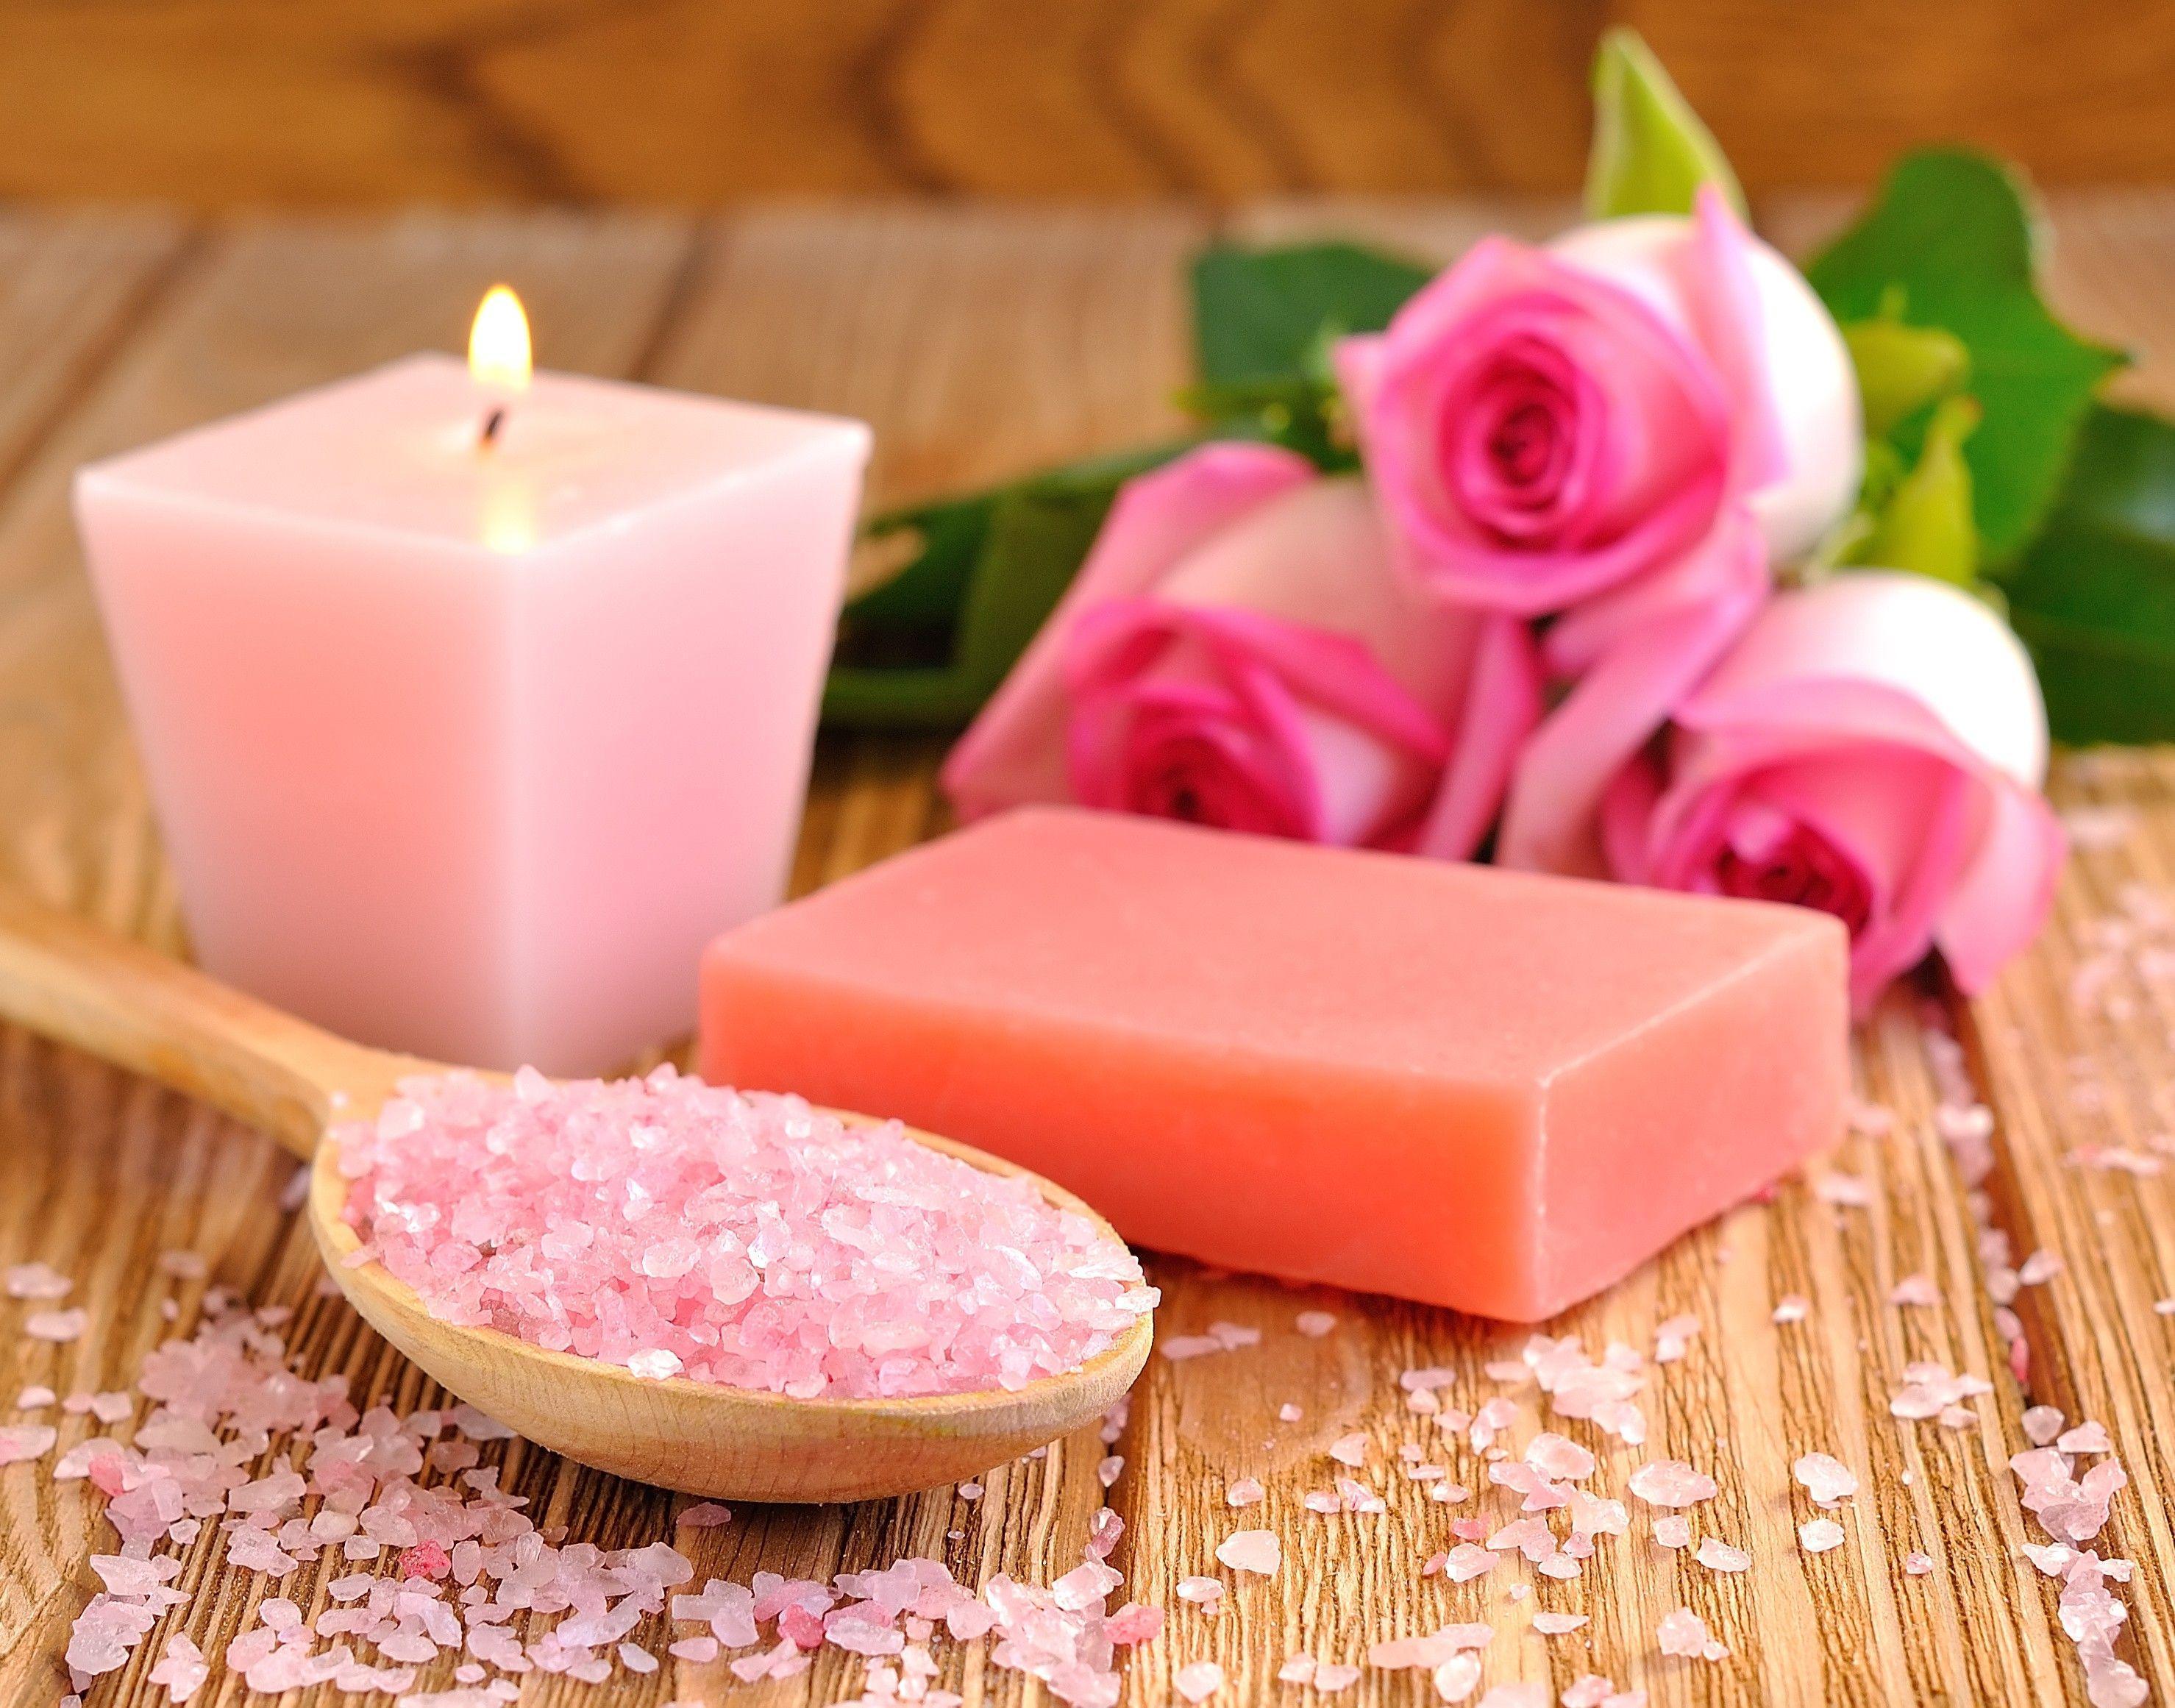 Flower Relaxing Spa Salt Pink Roses Soap Desktop Wallpaper